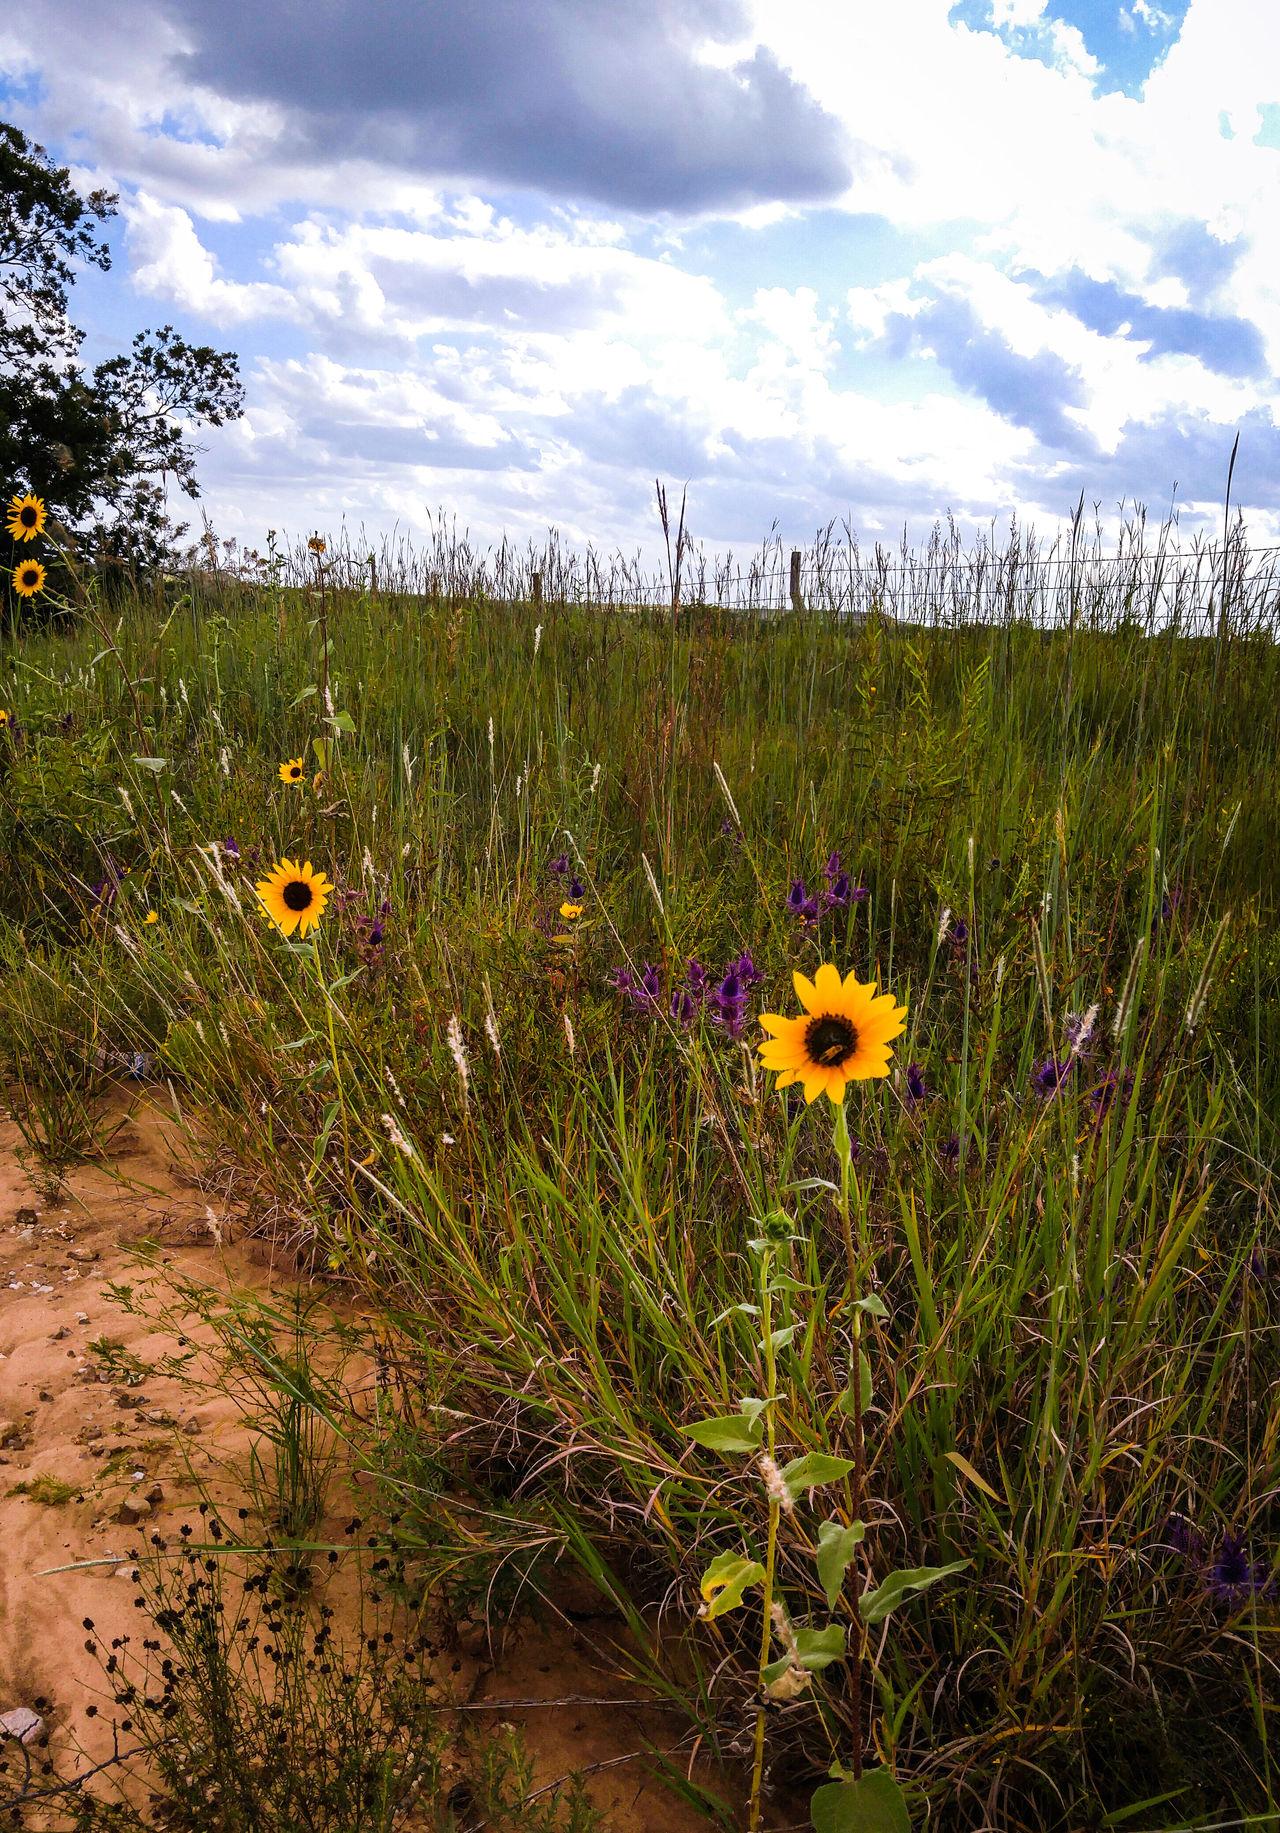 Roadside Wildflowers Nature Flower Scenics No People Landscape Rural Scene Gravel Roads Beauty In Nature Tranquil Scene Kansas